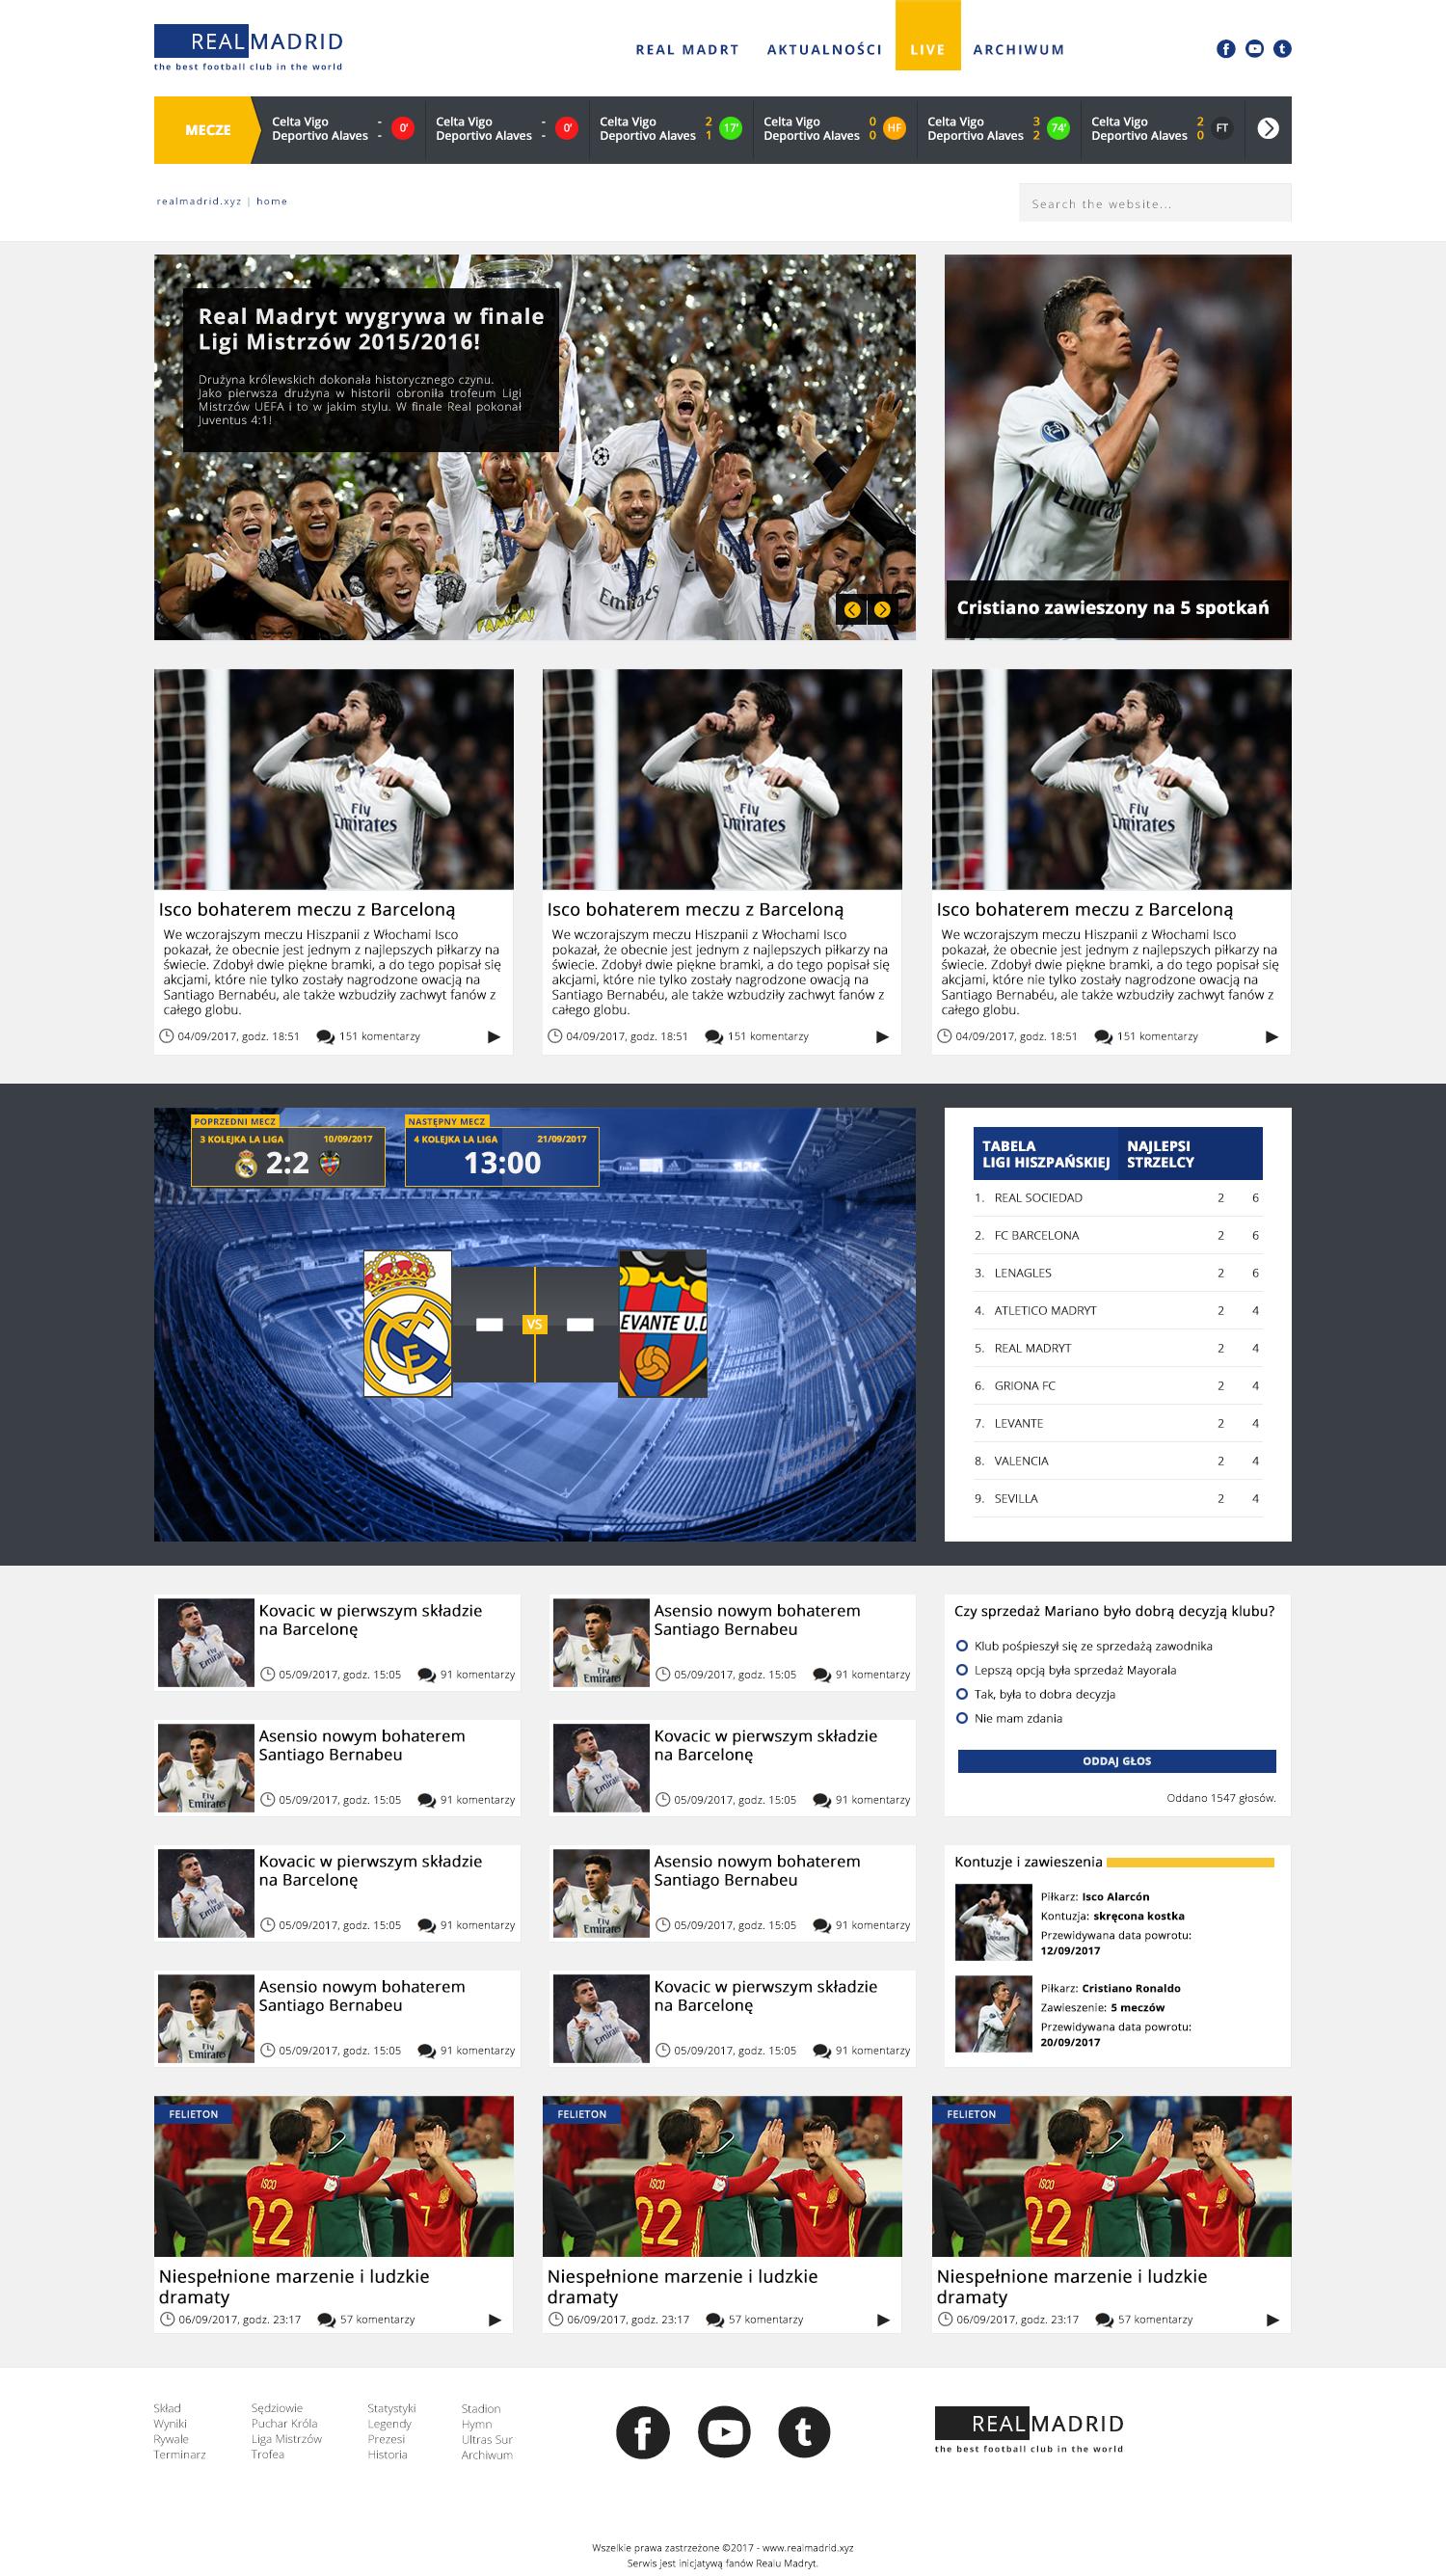 Real Madrid's Polish Web Site